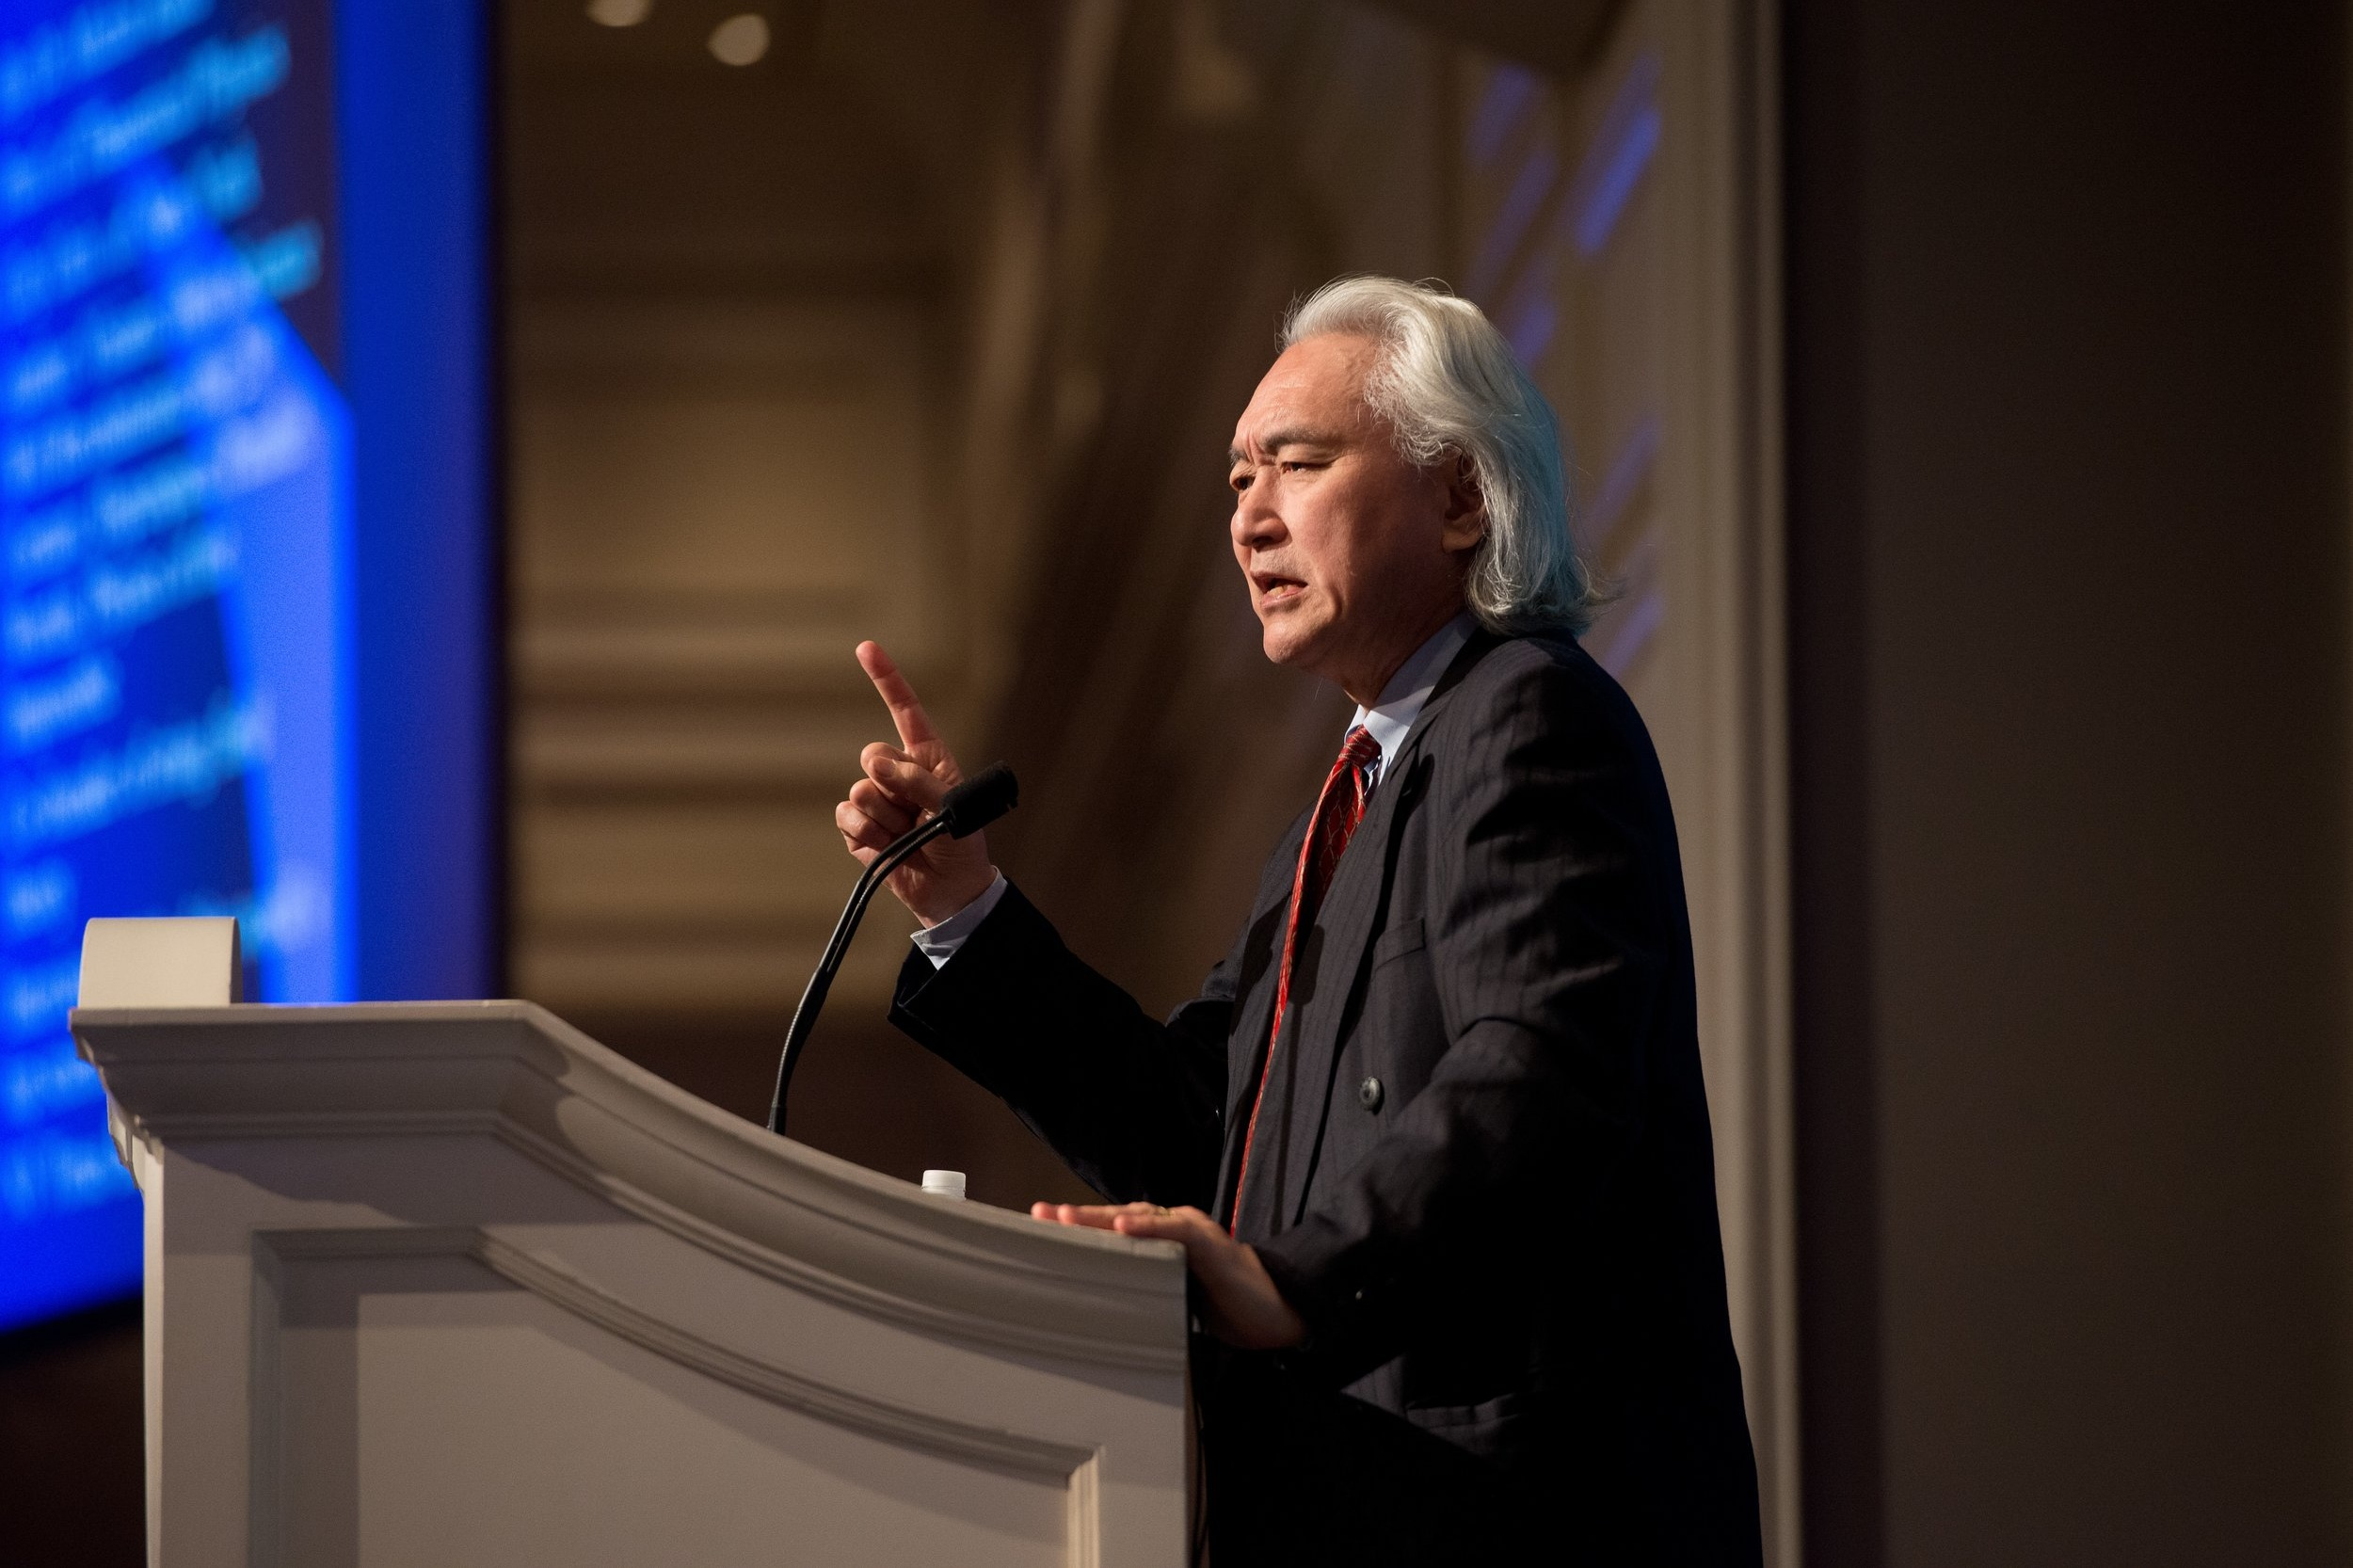 SALT 2013 - Best-Selling Author & Professor of Theoretical Physics DR. MICHIO KAKU